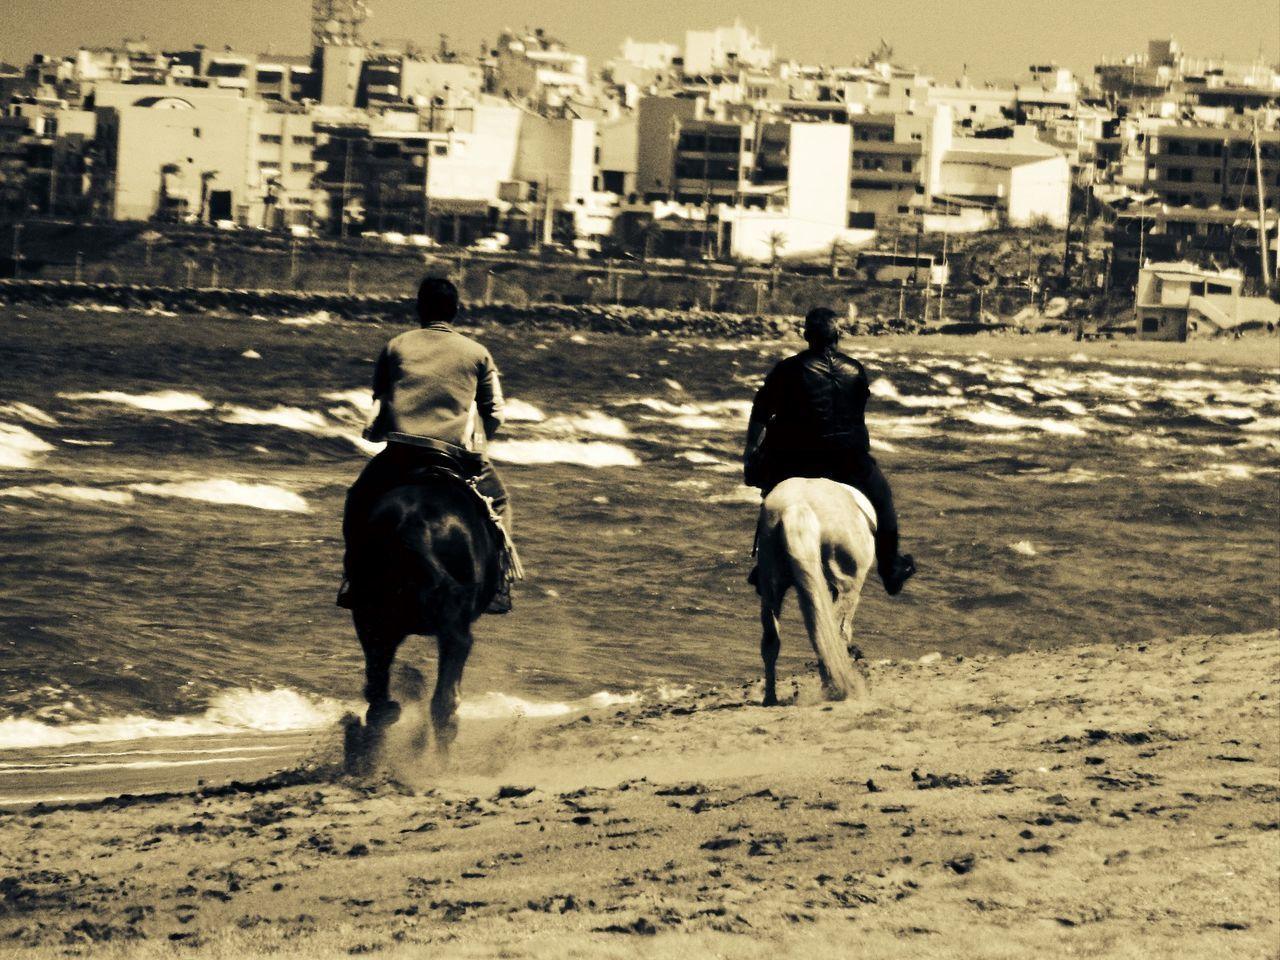 Horses at the Beach. Beach Beachphotography Horse Horses Edited Beauty In Nature Amoudara Kreta Day Outdoors Water A Beautiful Landscape Photo